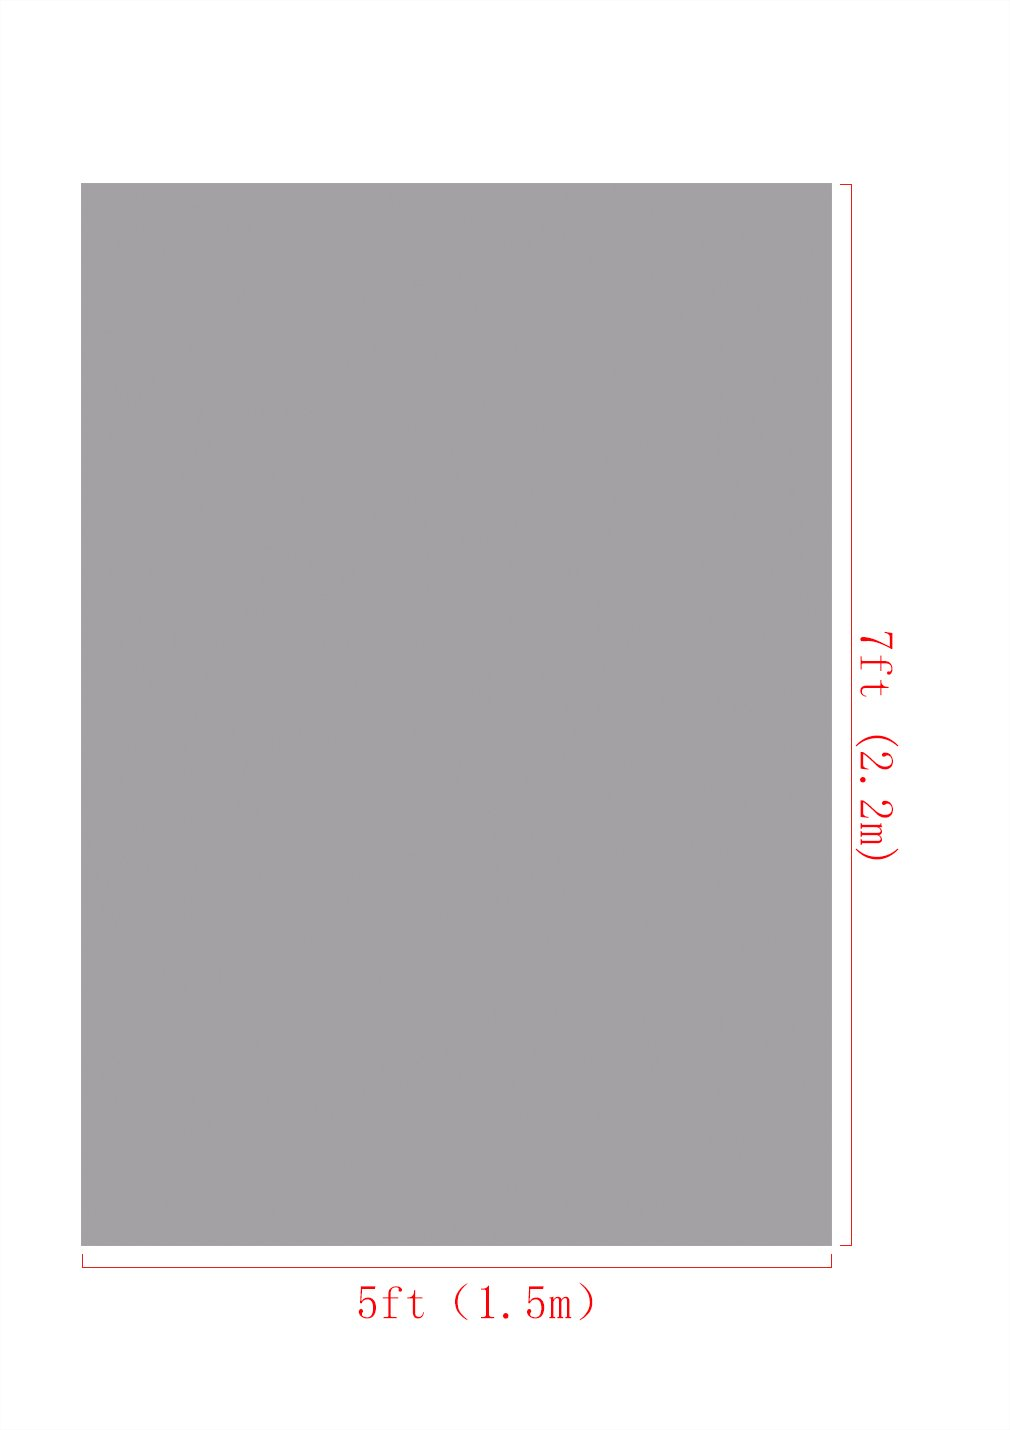 Kate 5x7ft//1.5x2.2m Fondo de Color de Textura Fisuras Retro Fondo Negro s/ólido para ni/ños Estudio Familiar de fotograf/ía